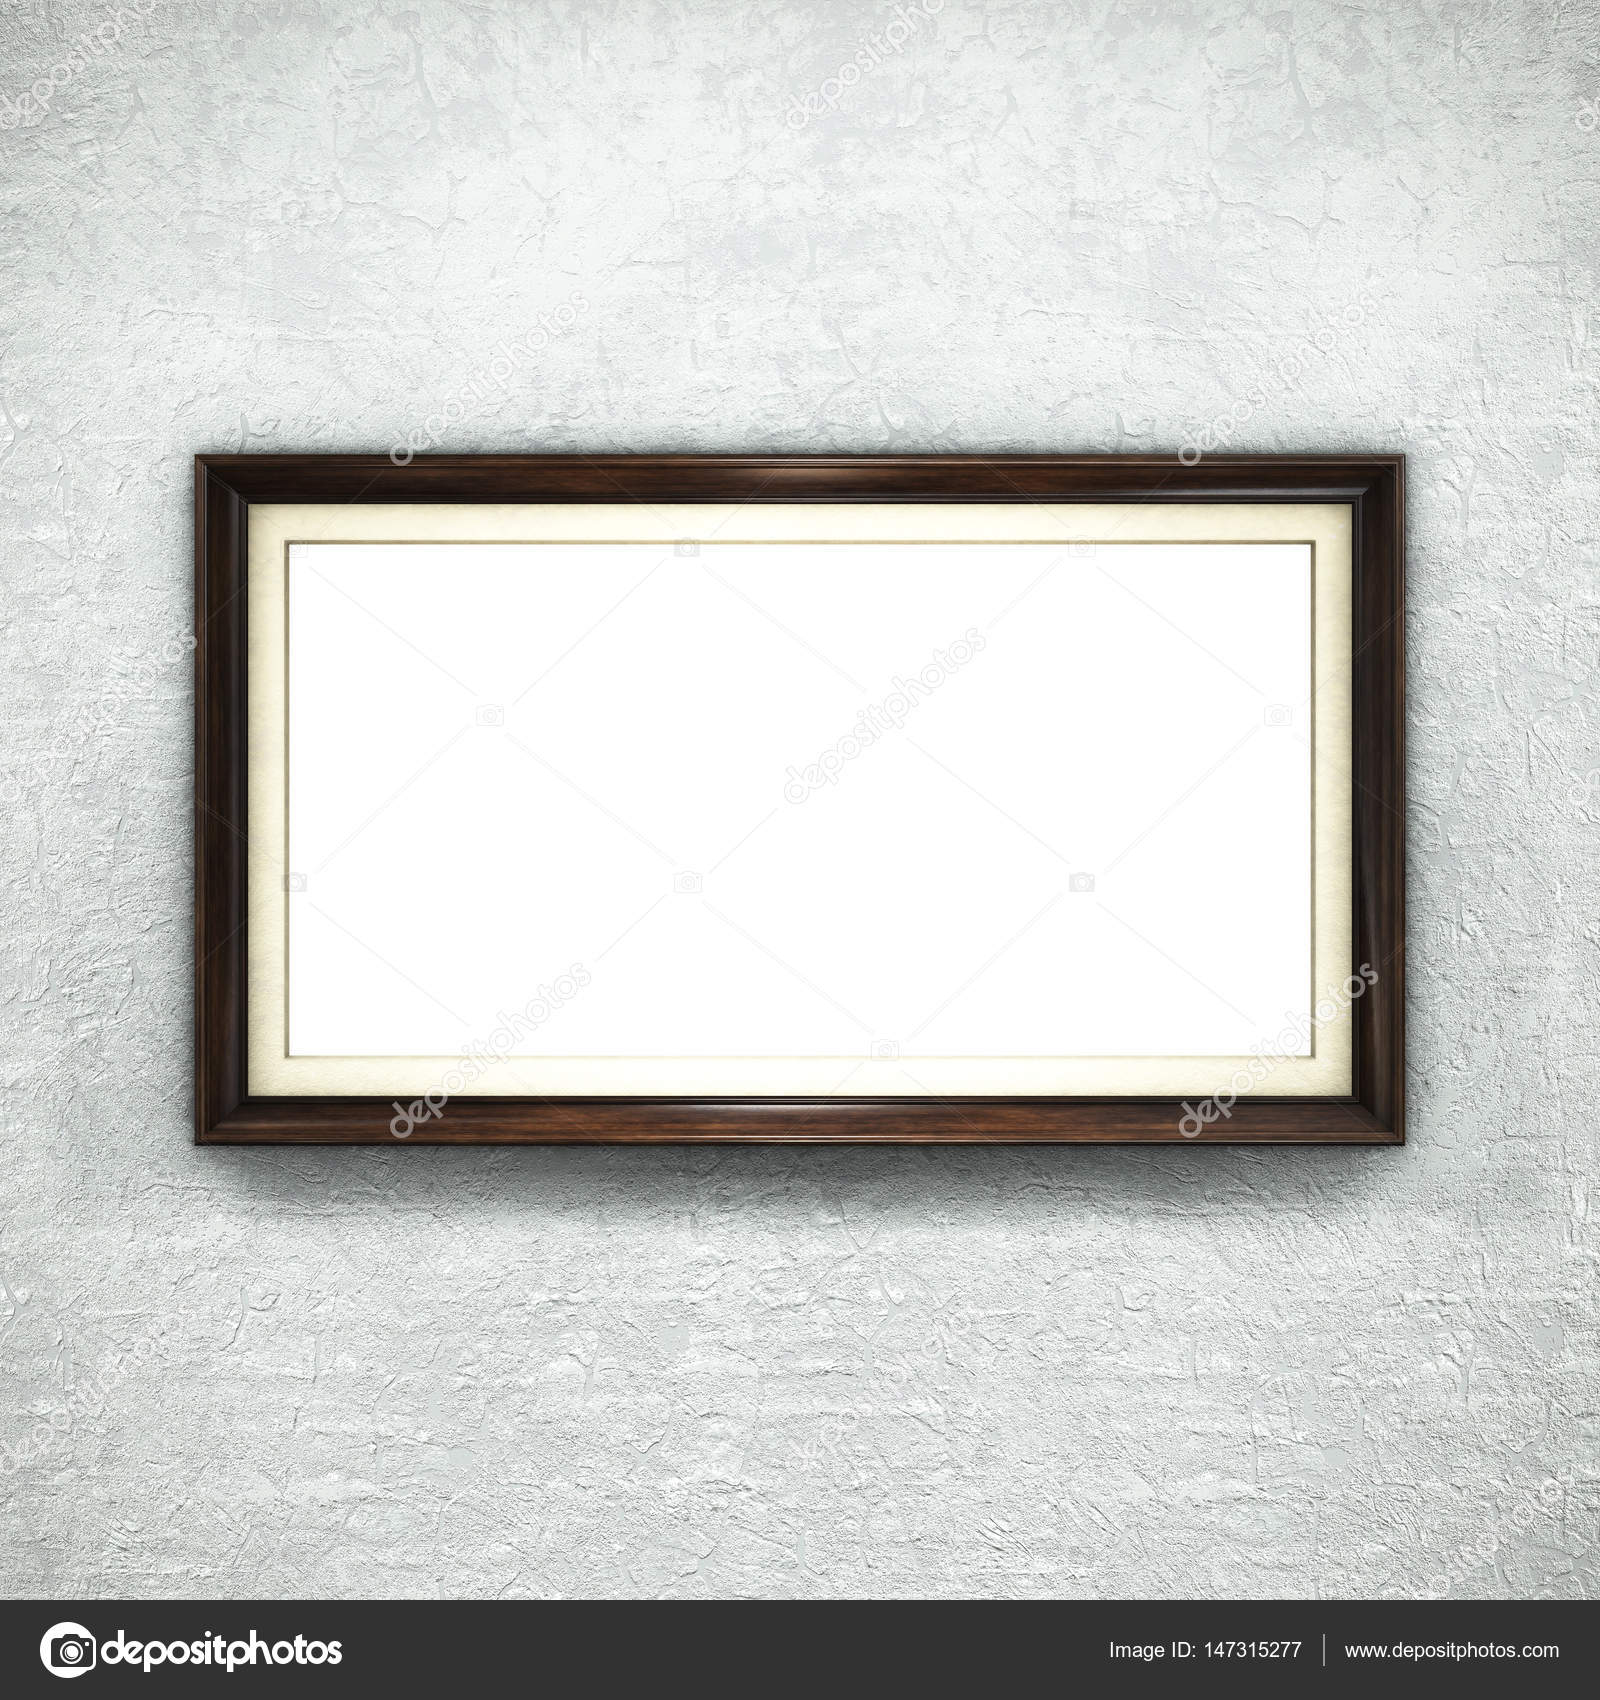 Marco de madera en el fondo de pantalla — Fotos de Stock © Irochka ...